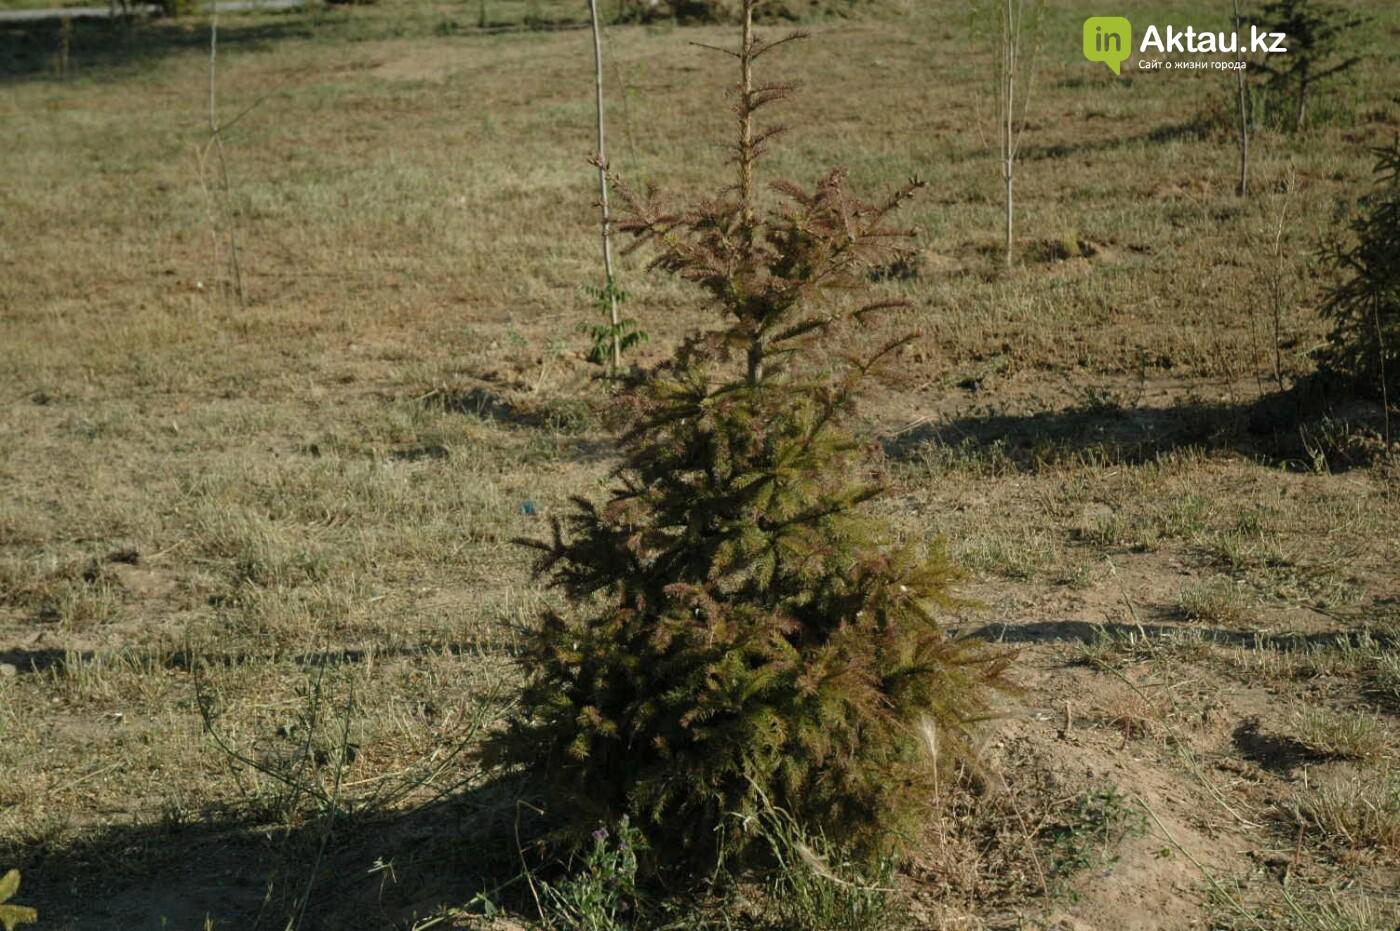 Погибшие от засухи и обезвоживания в Актау исчисляются десятками (ФОТО), фото-6